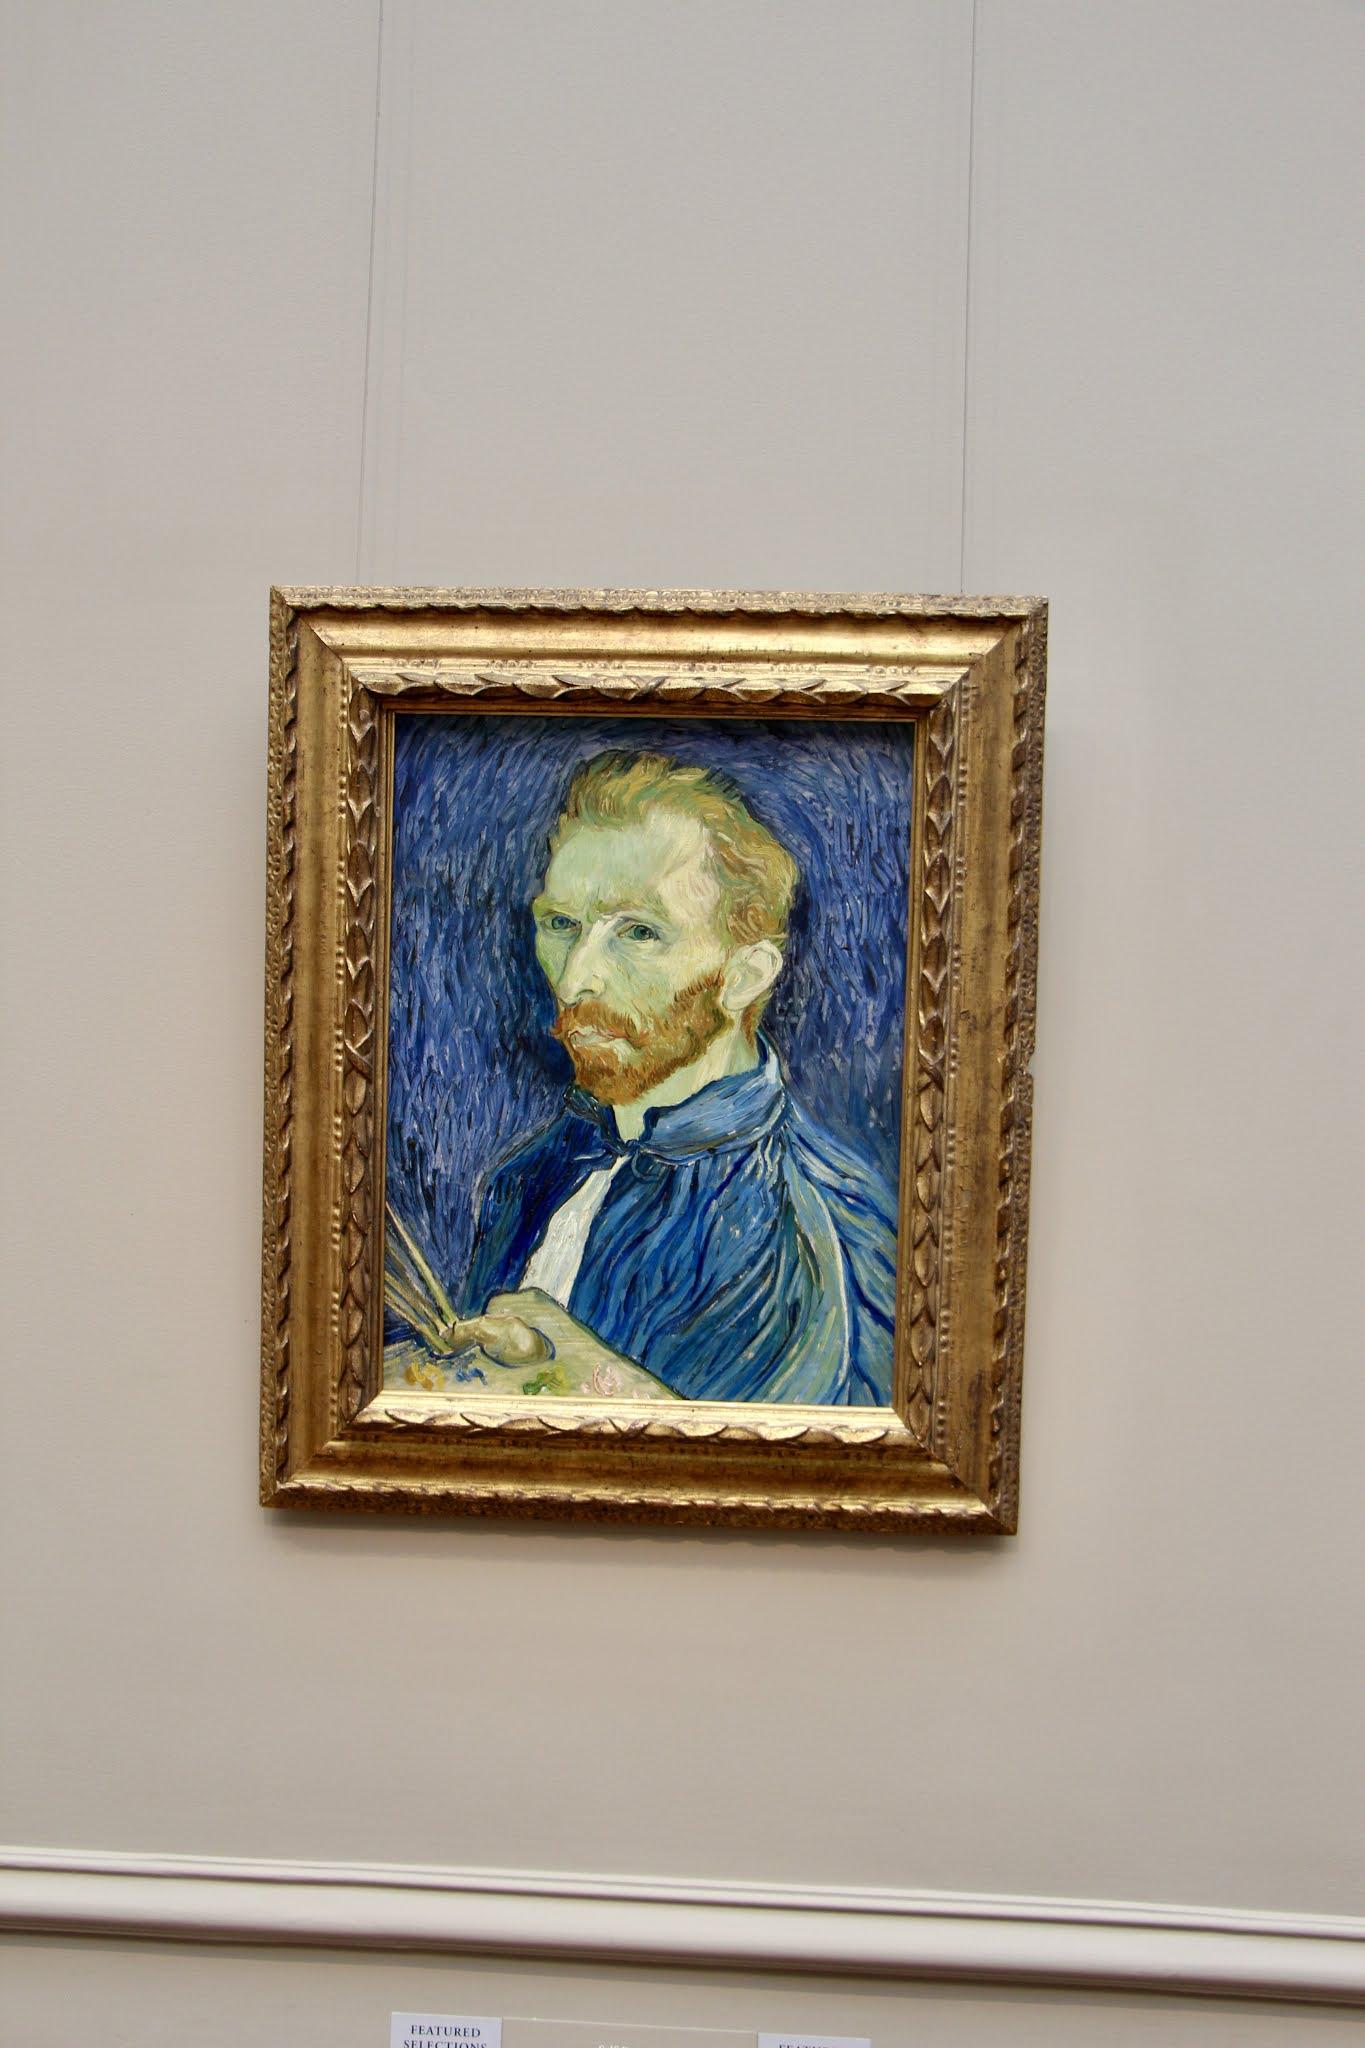 National gallery, van gogh, museum, art museum, travel guide